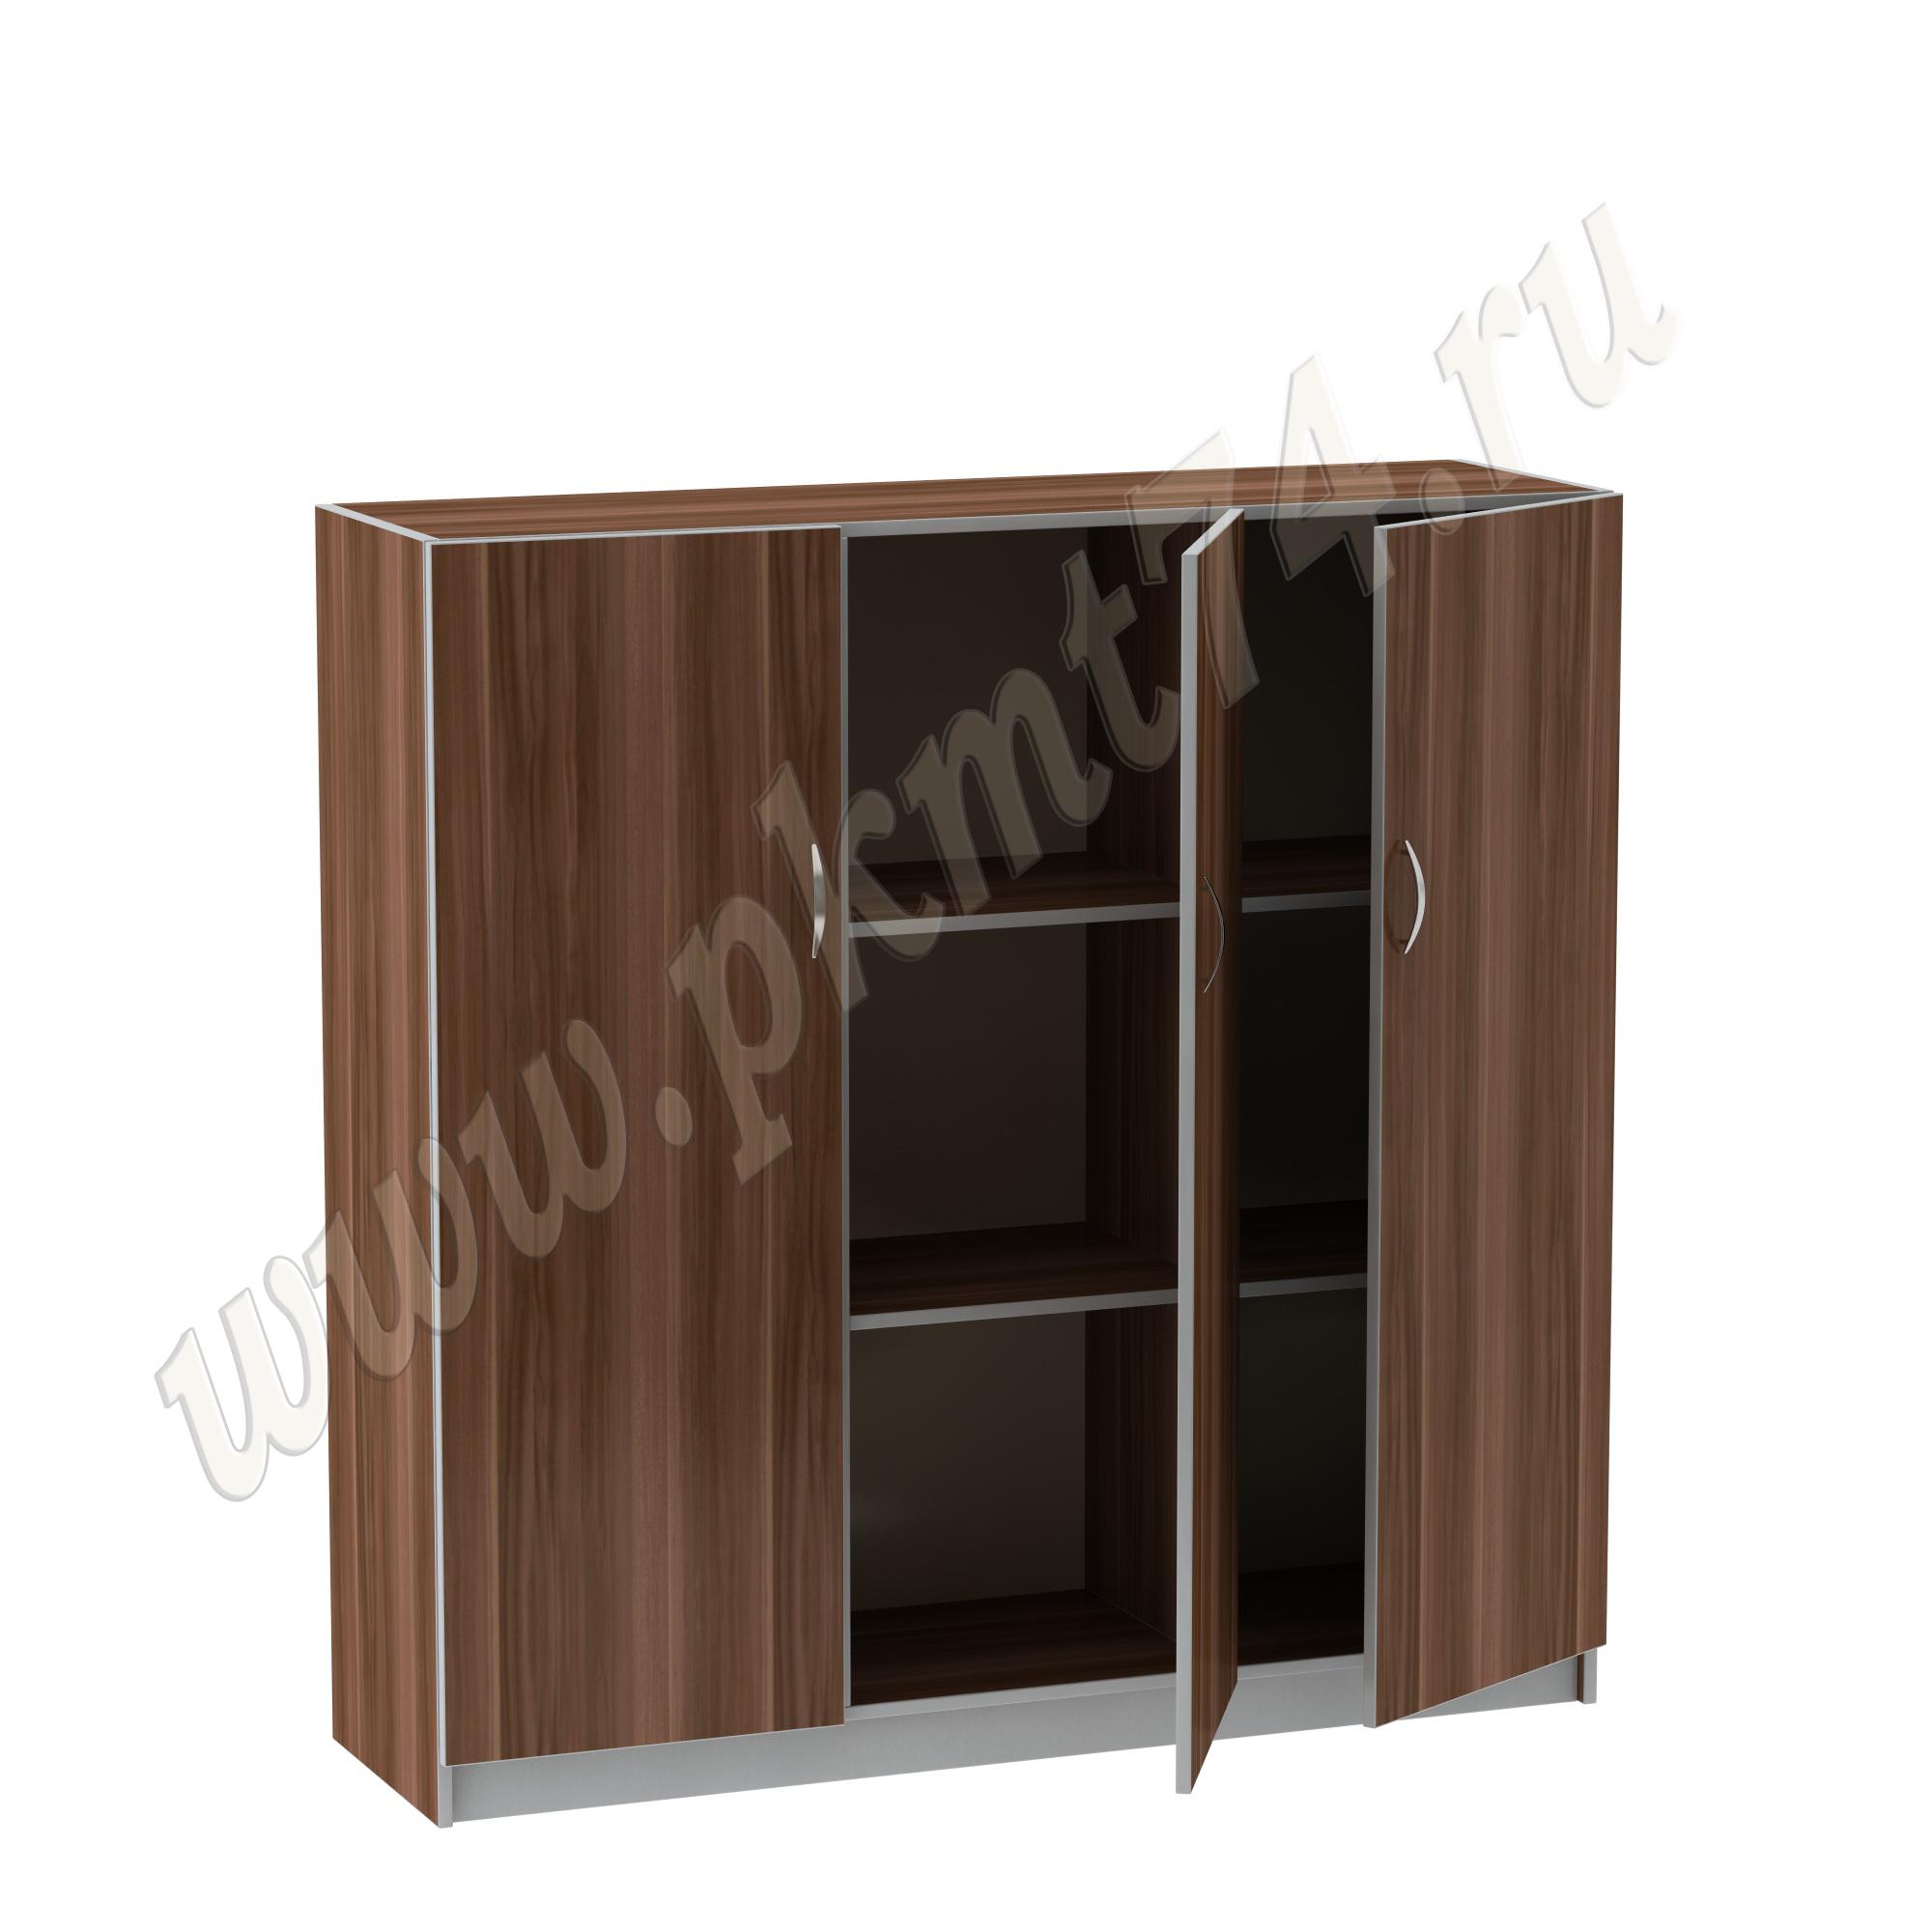 Шкаф широкий офисный MT 14-12 Слива-Алюминий